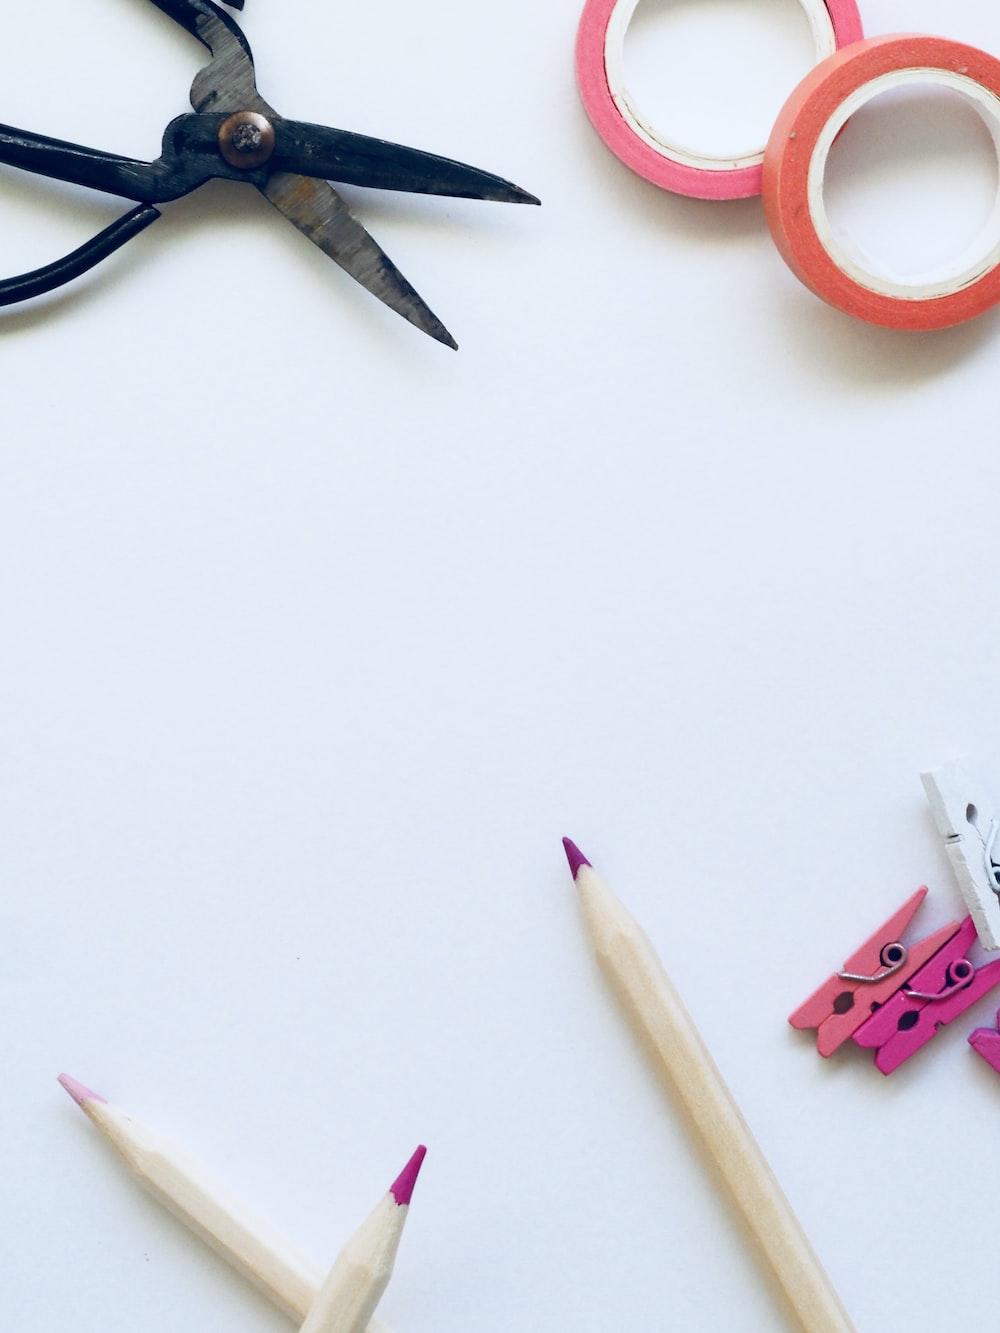 three pens beside scissors